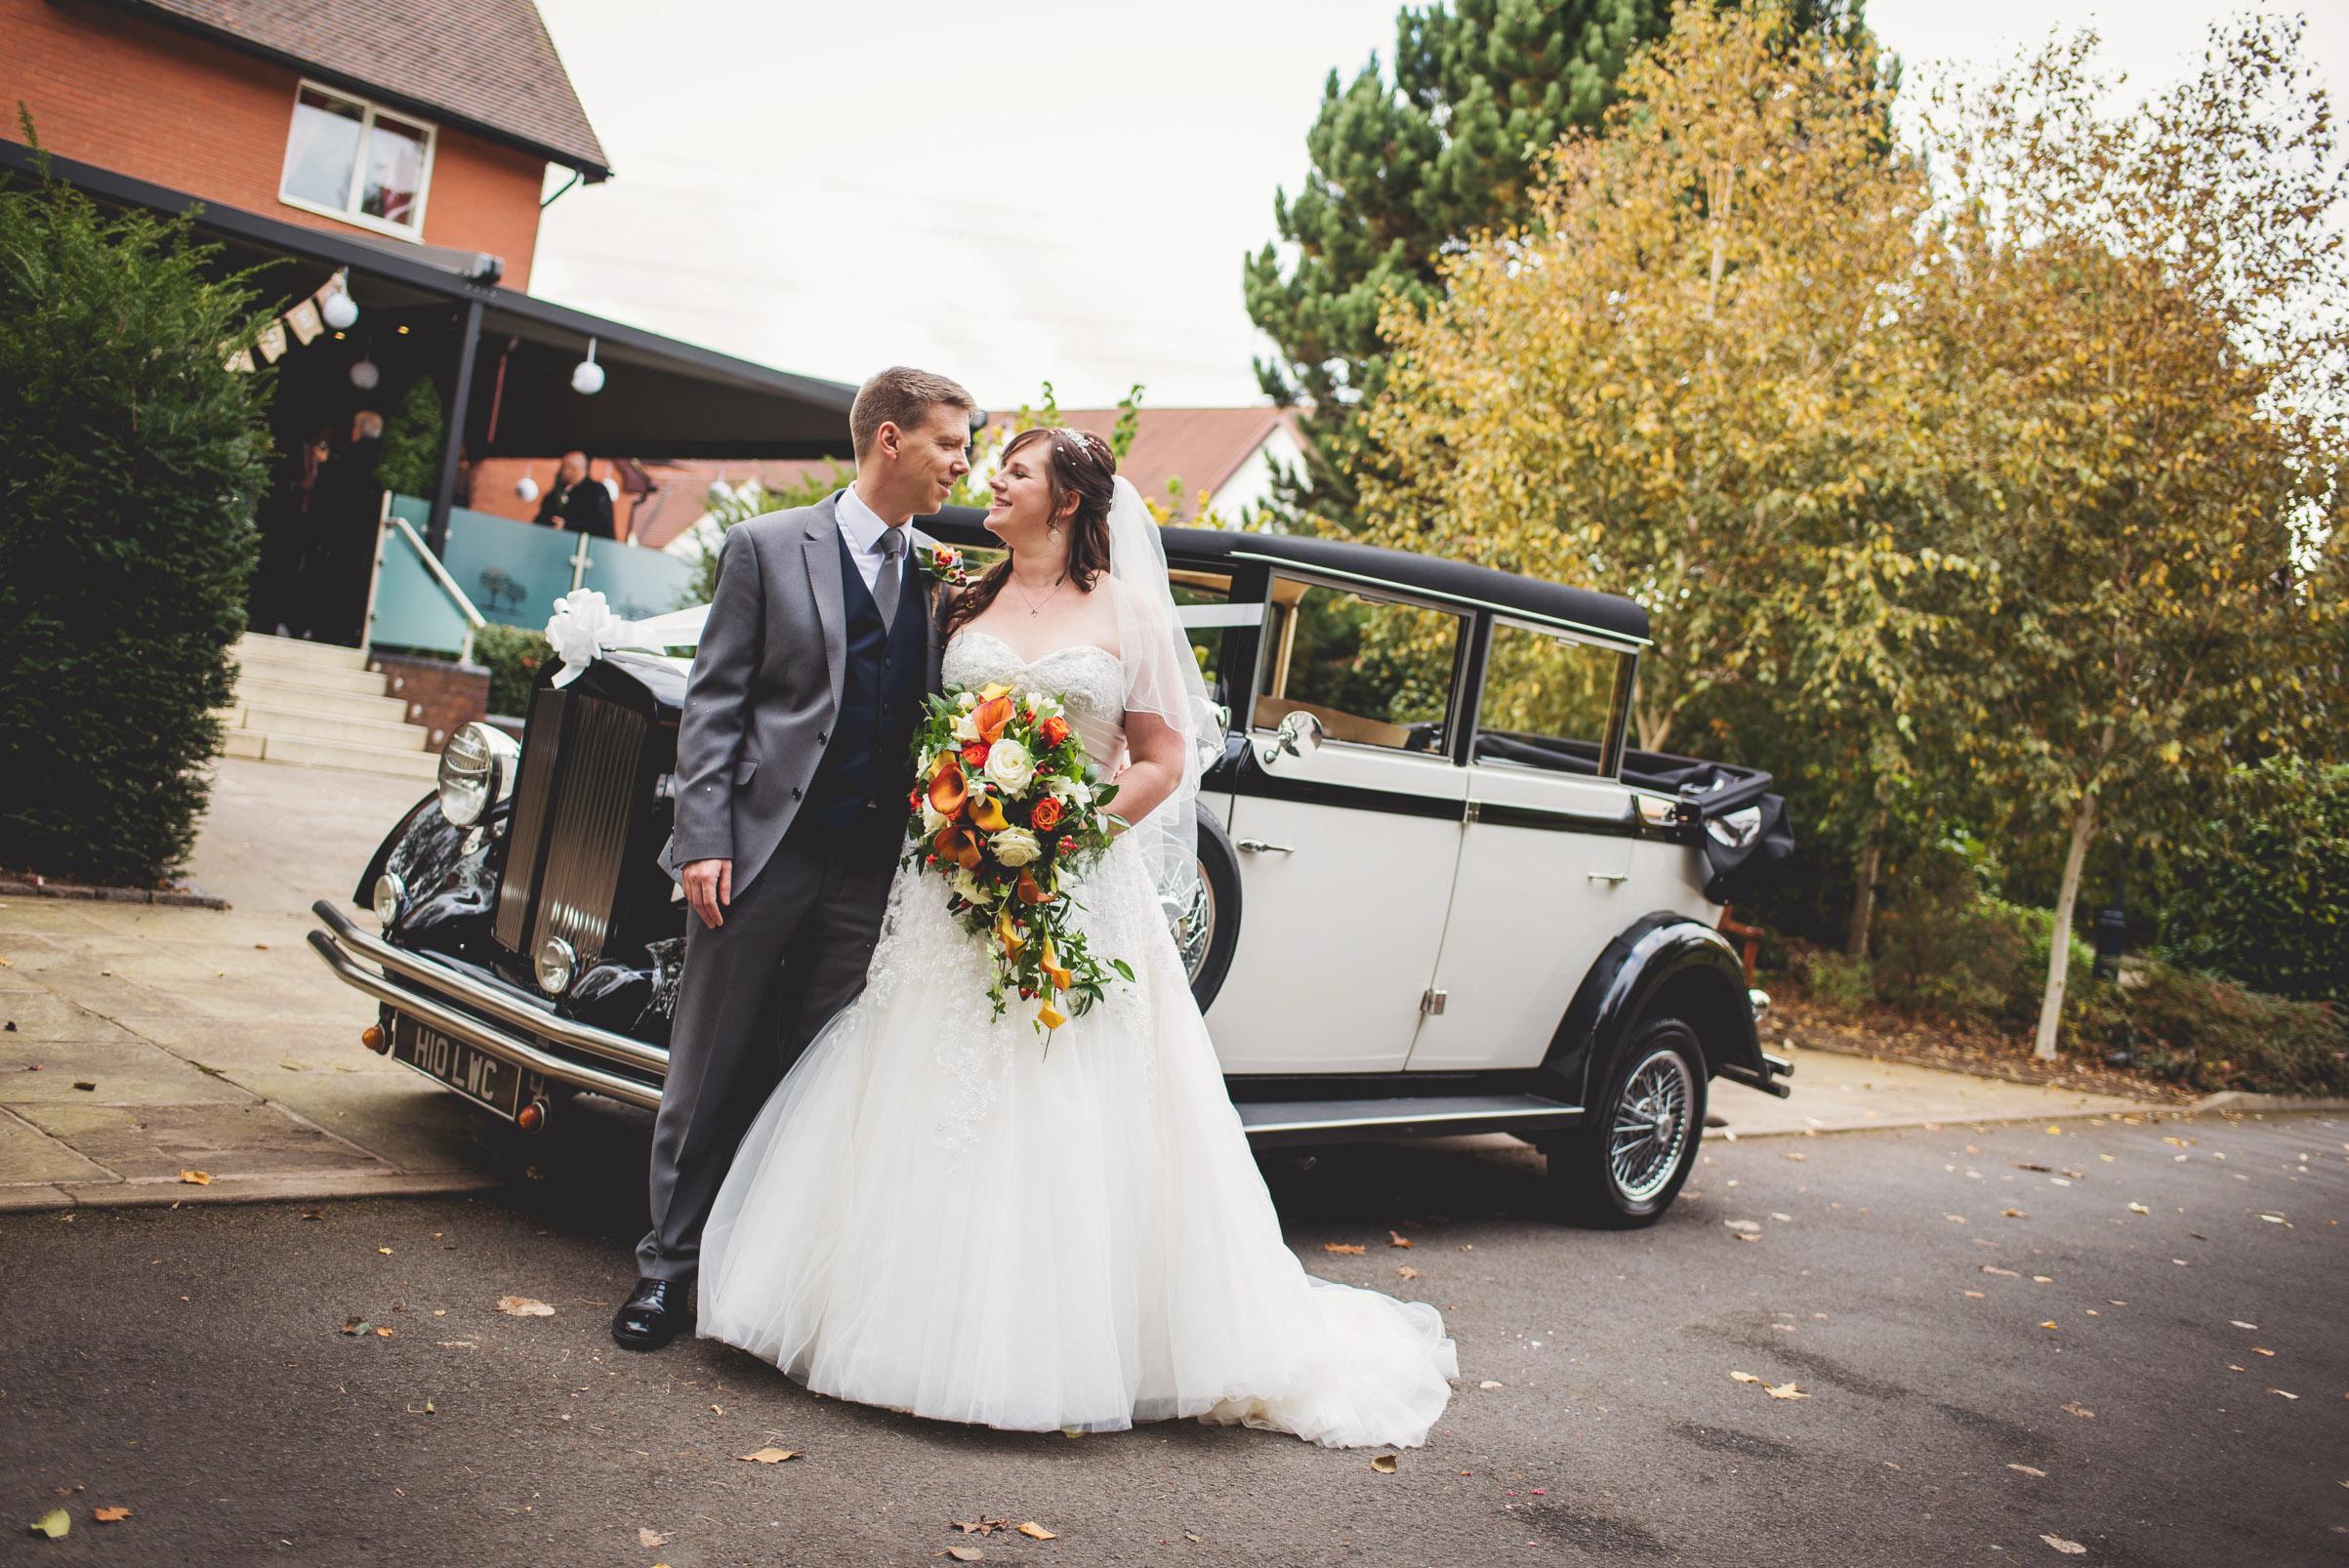 The+Fairlawns+wedding+Aldridge+StLukes+Church-122.jpg